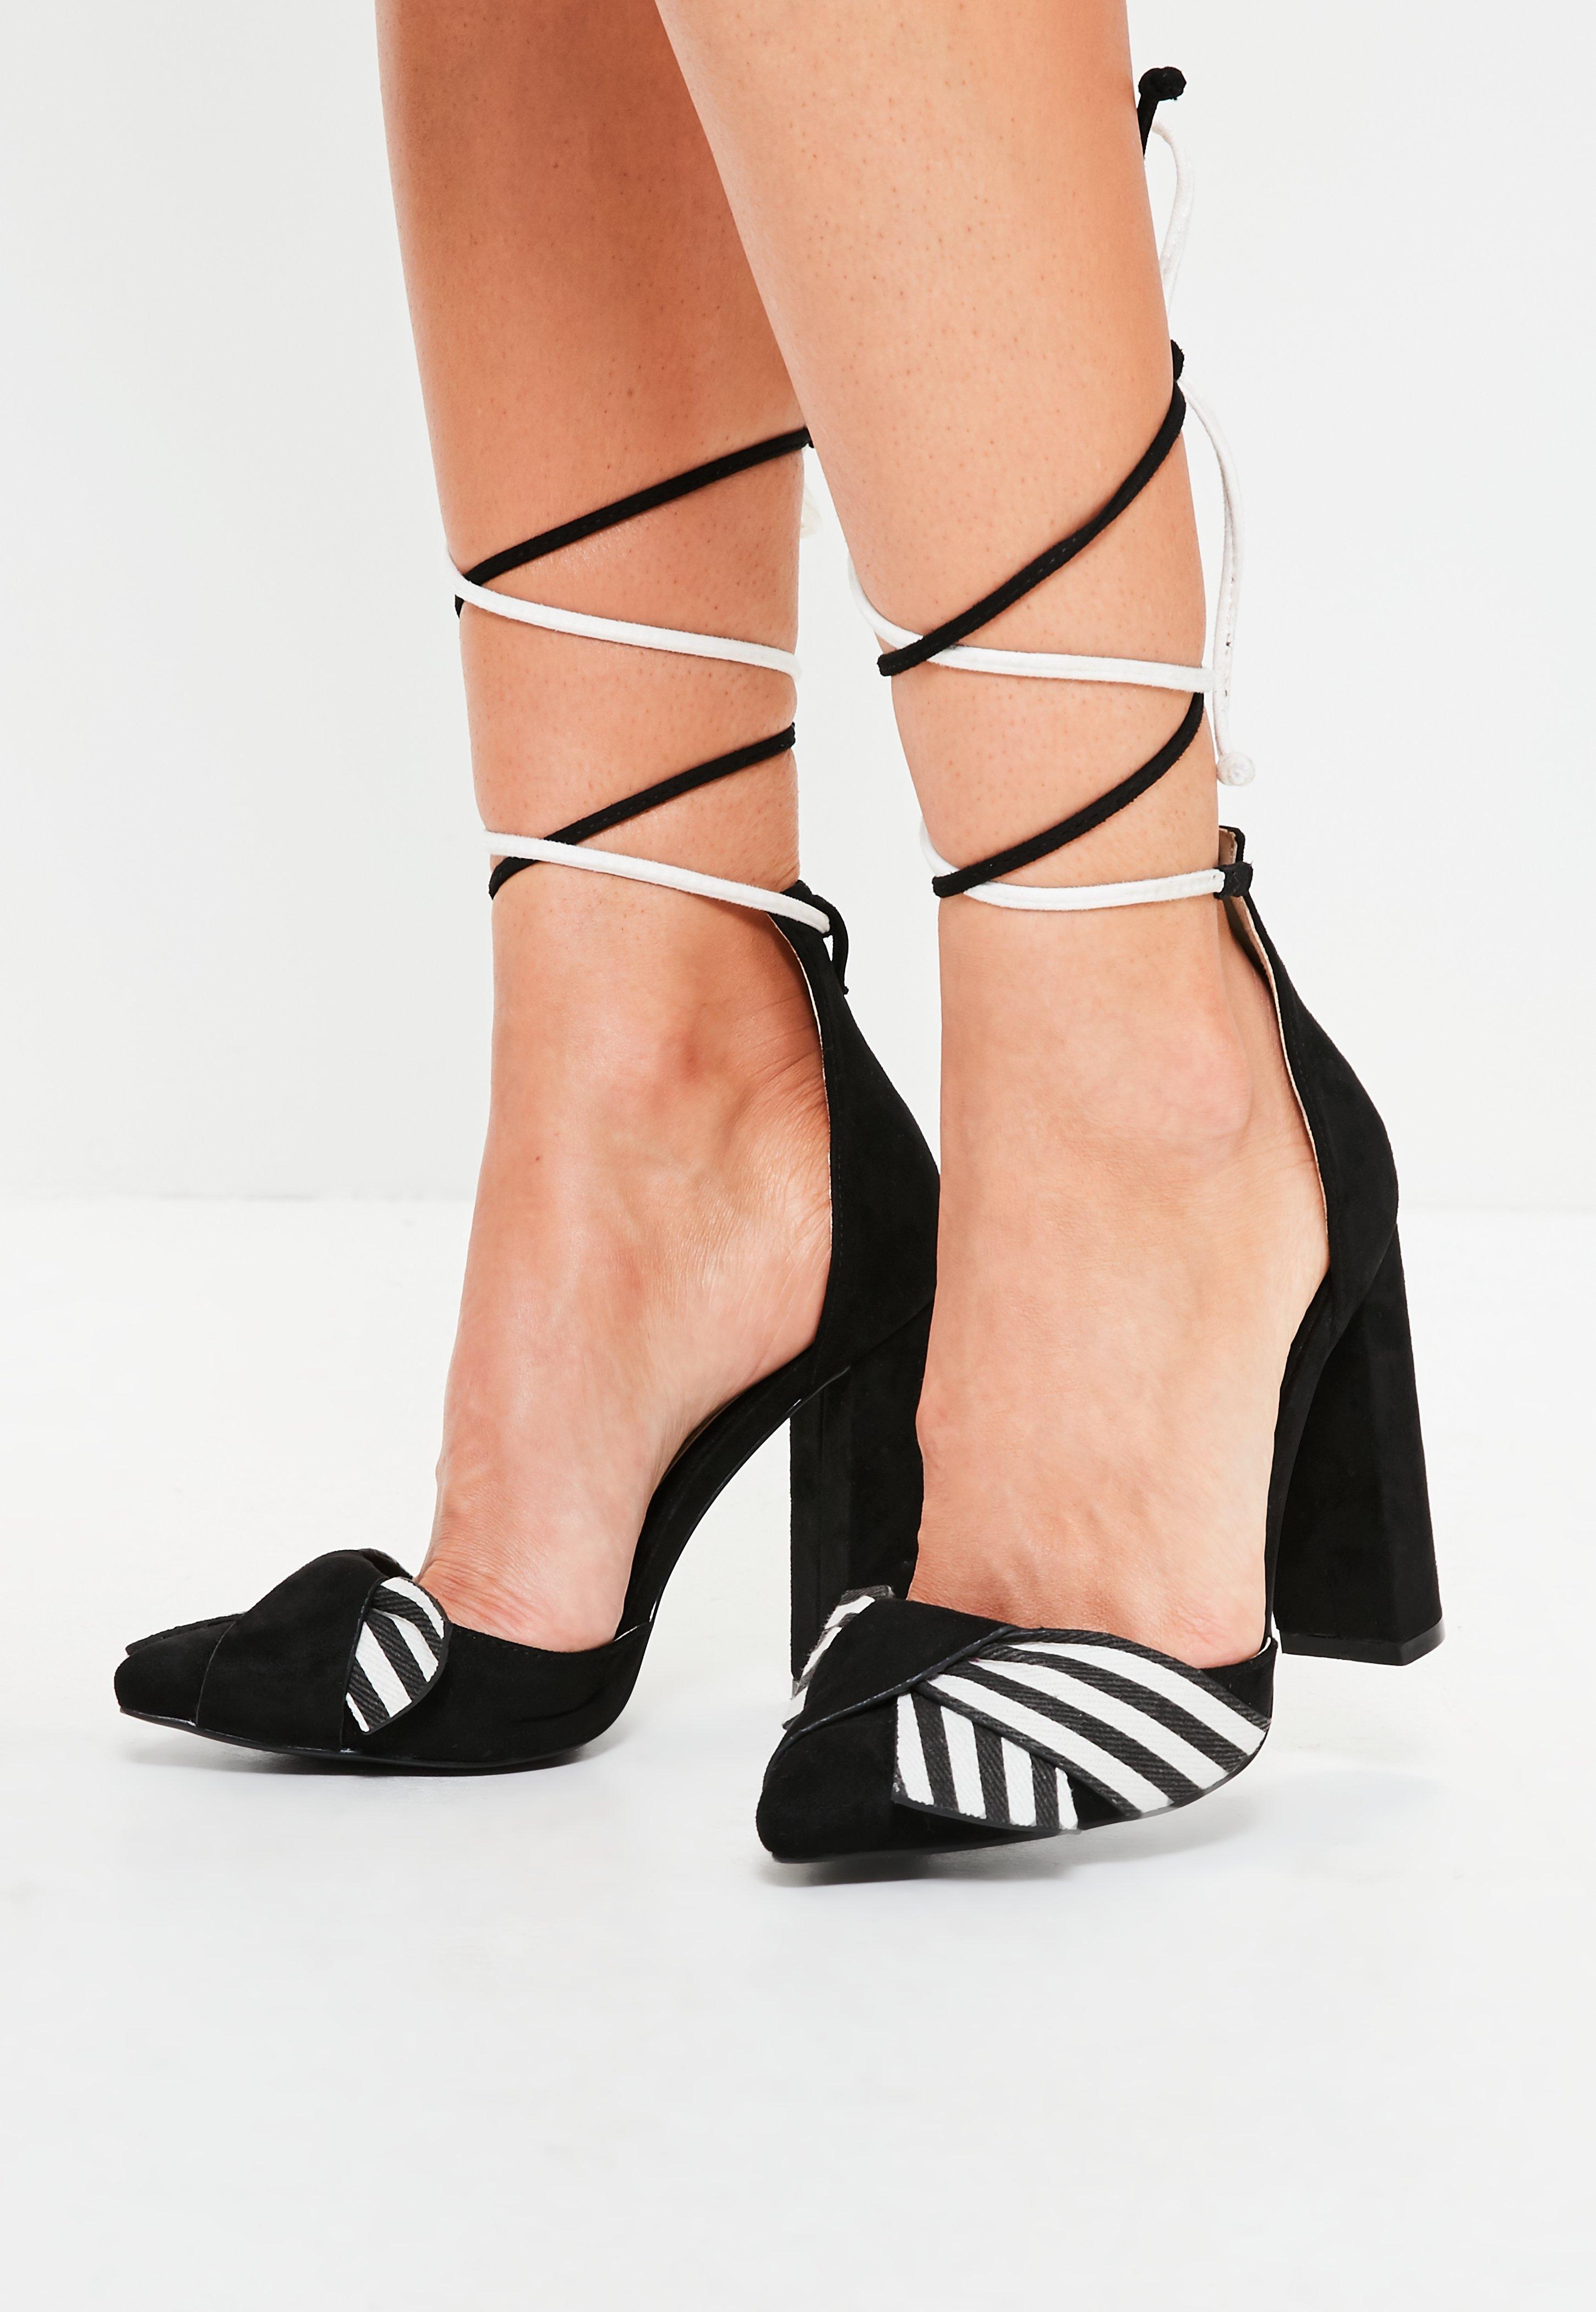 09814548d53 Lyst - Missguided Black Striped Wrap Around Block Heel Sandals in Black